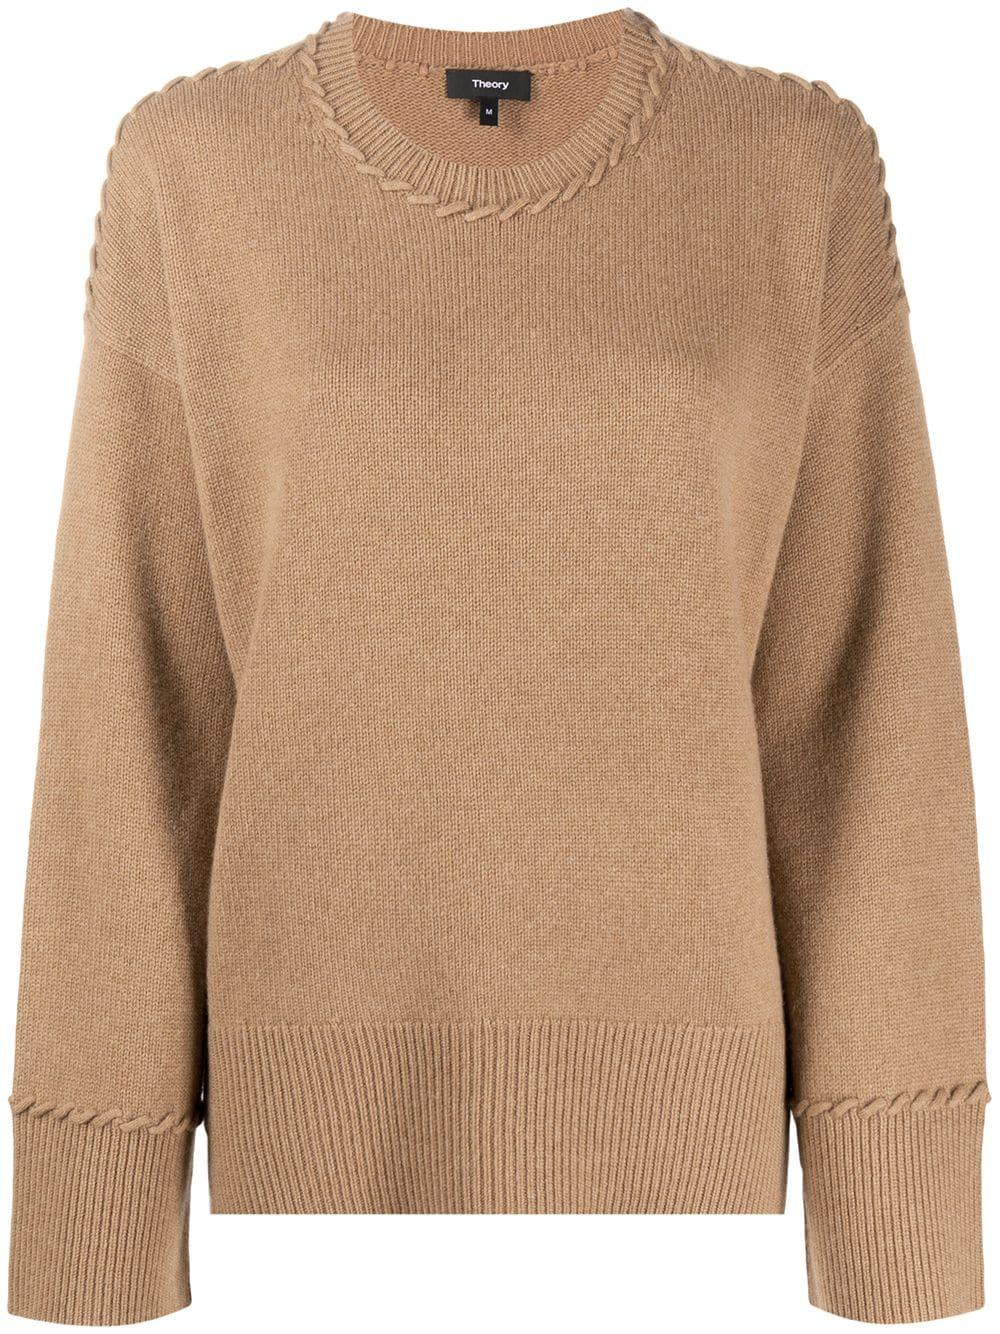 Karenia Oversized Cashmere Sweater